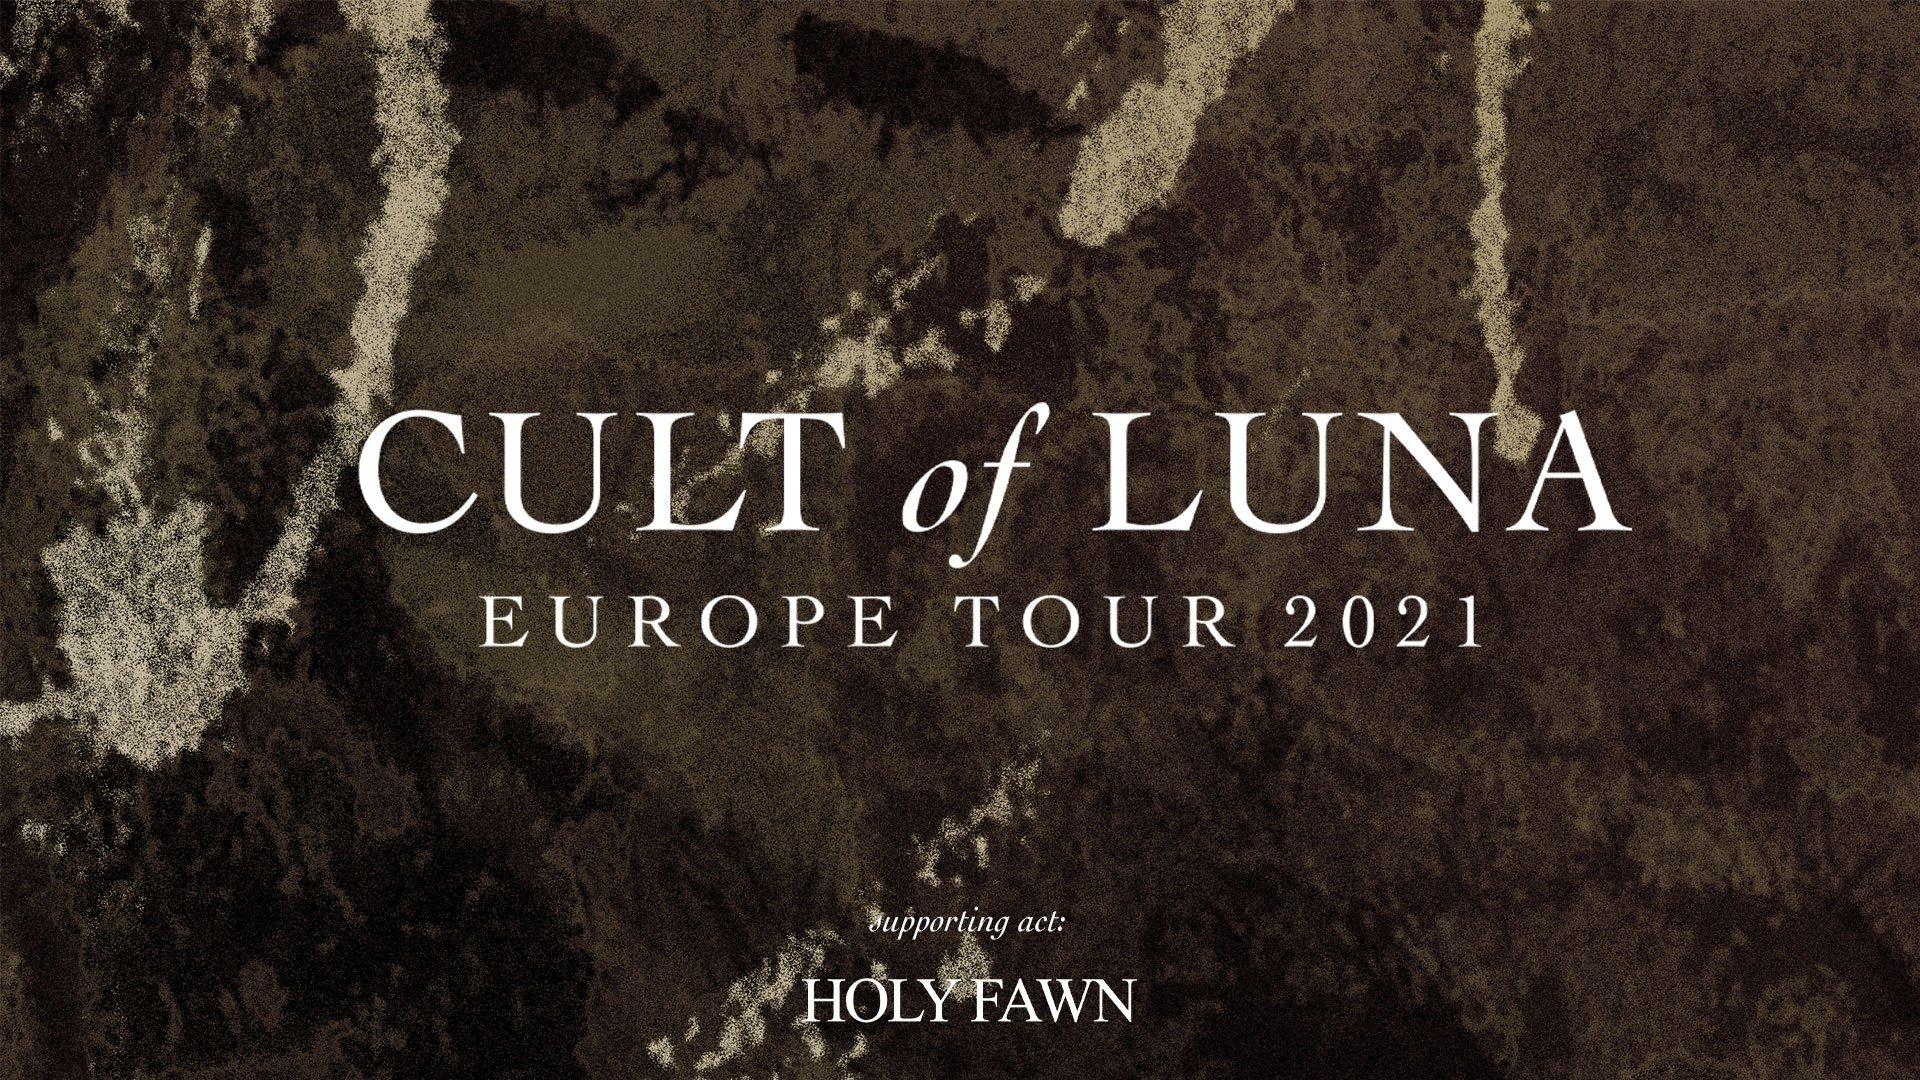 Cult-of-Luna-1920x1080-website